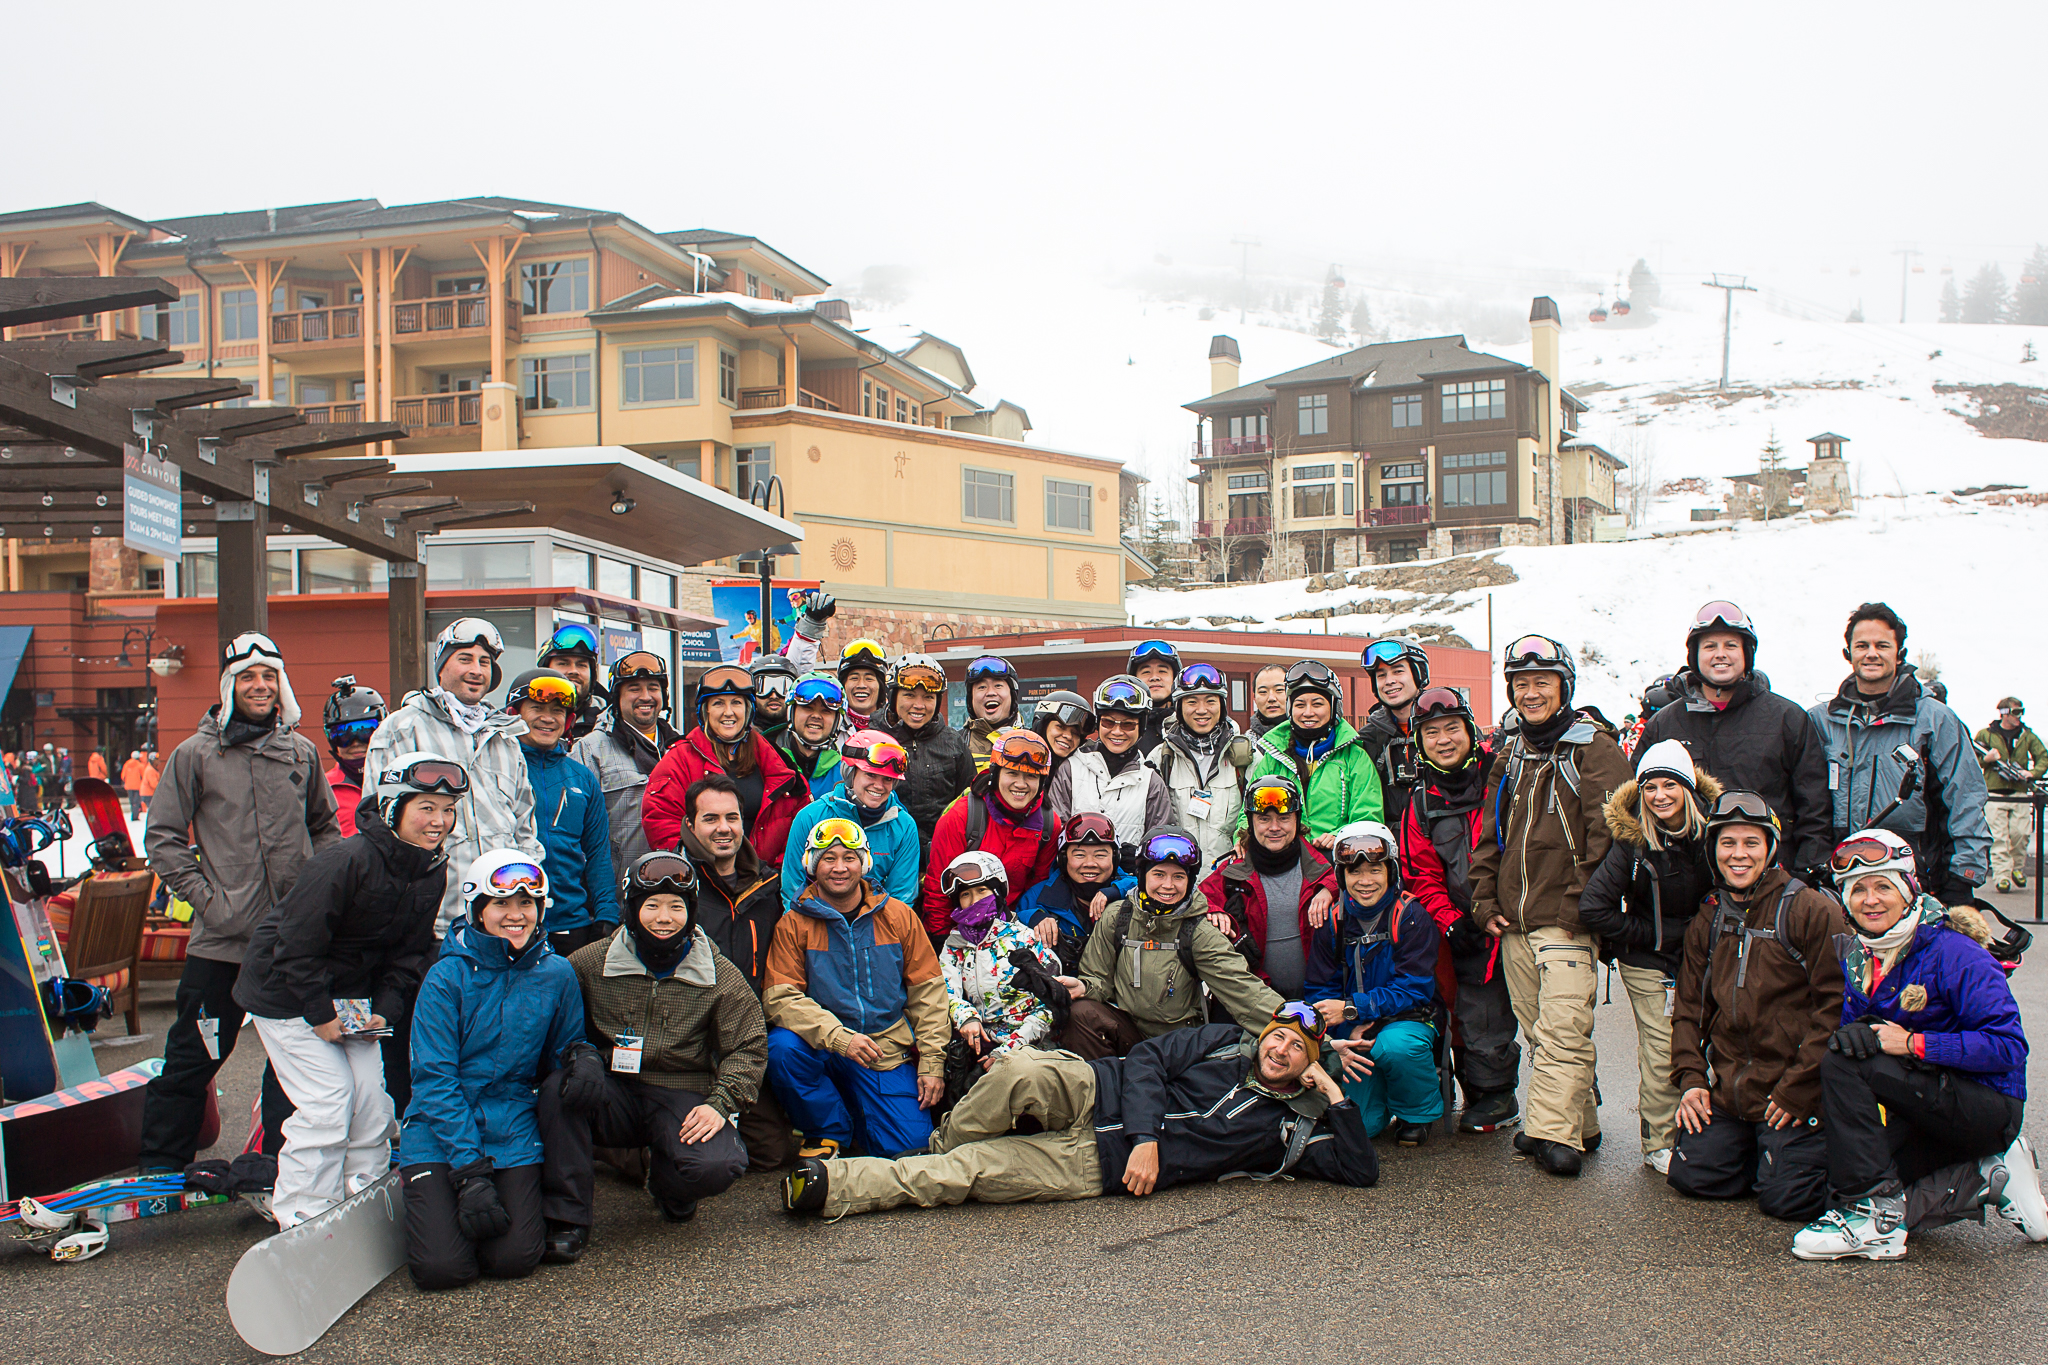 More than Sundance